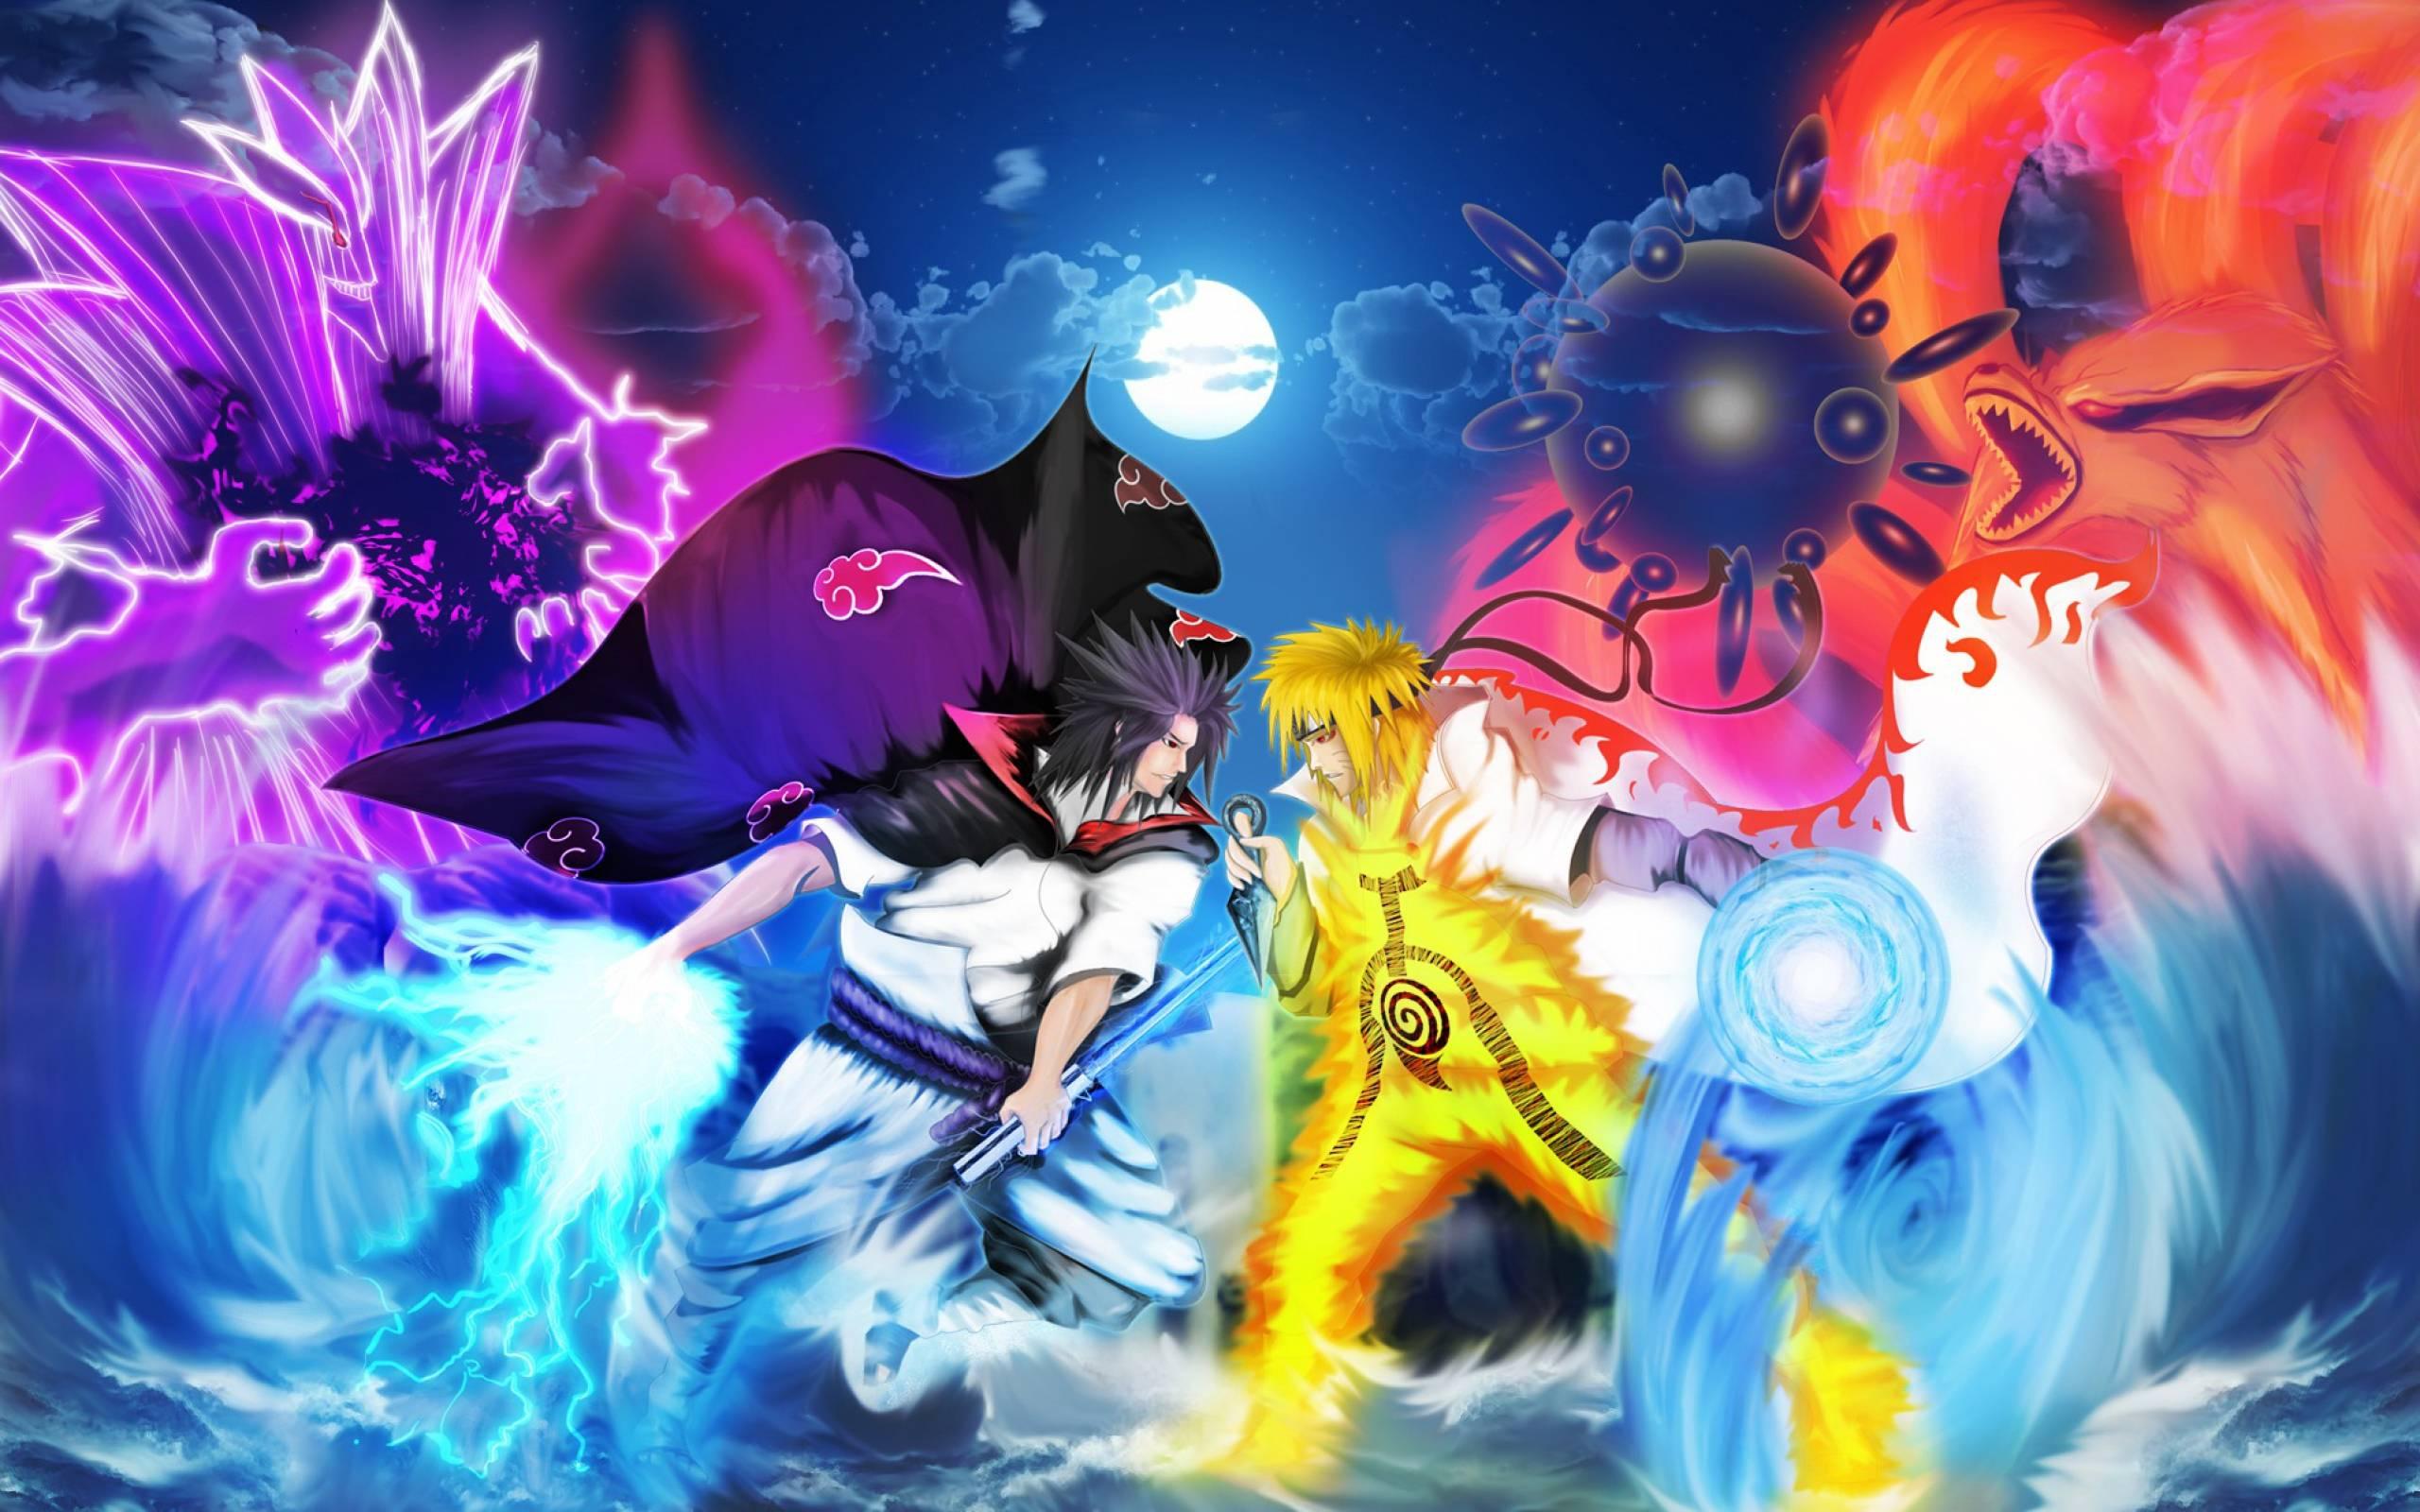 Naruto Vs Sasuke Wallpapers 2560x1600